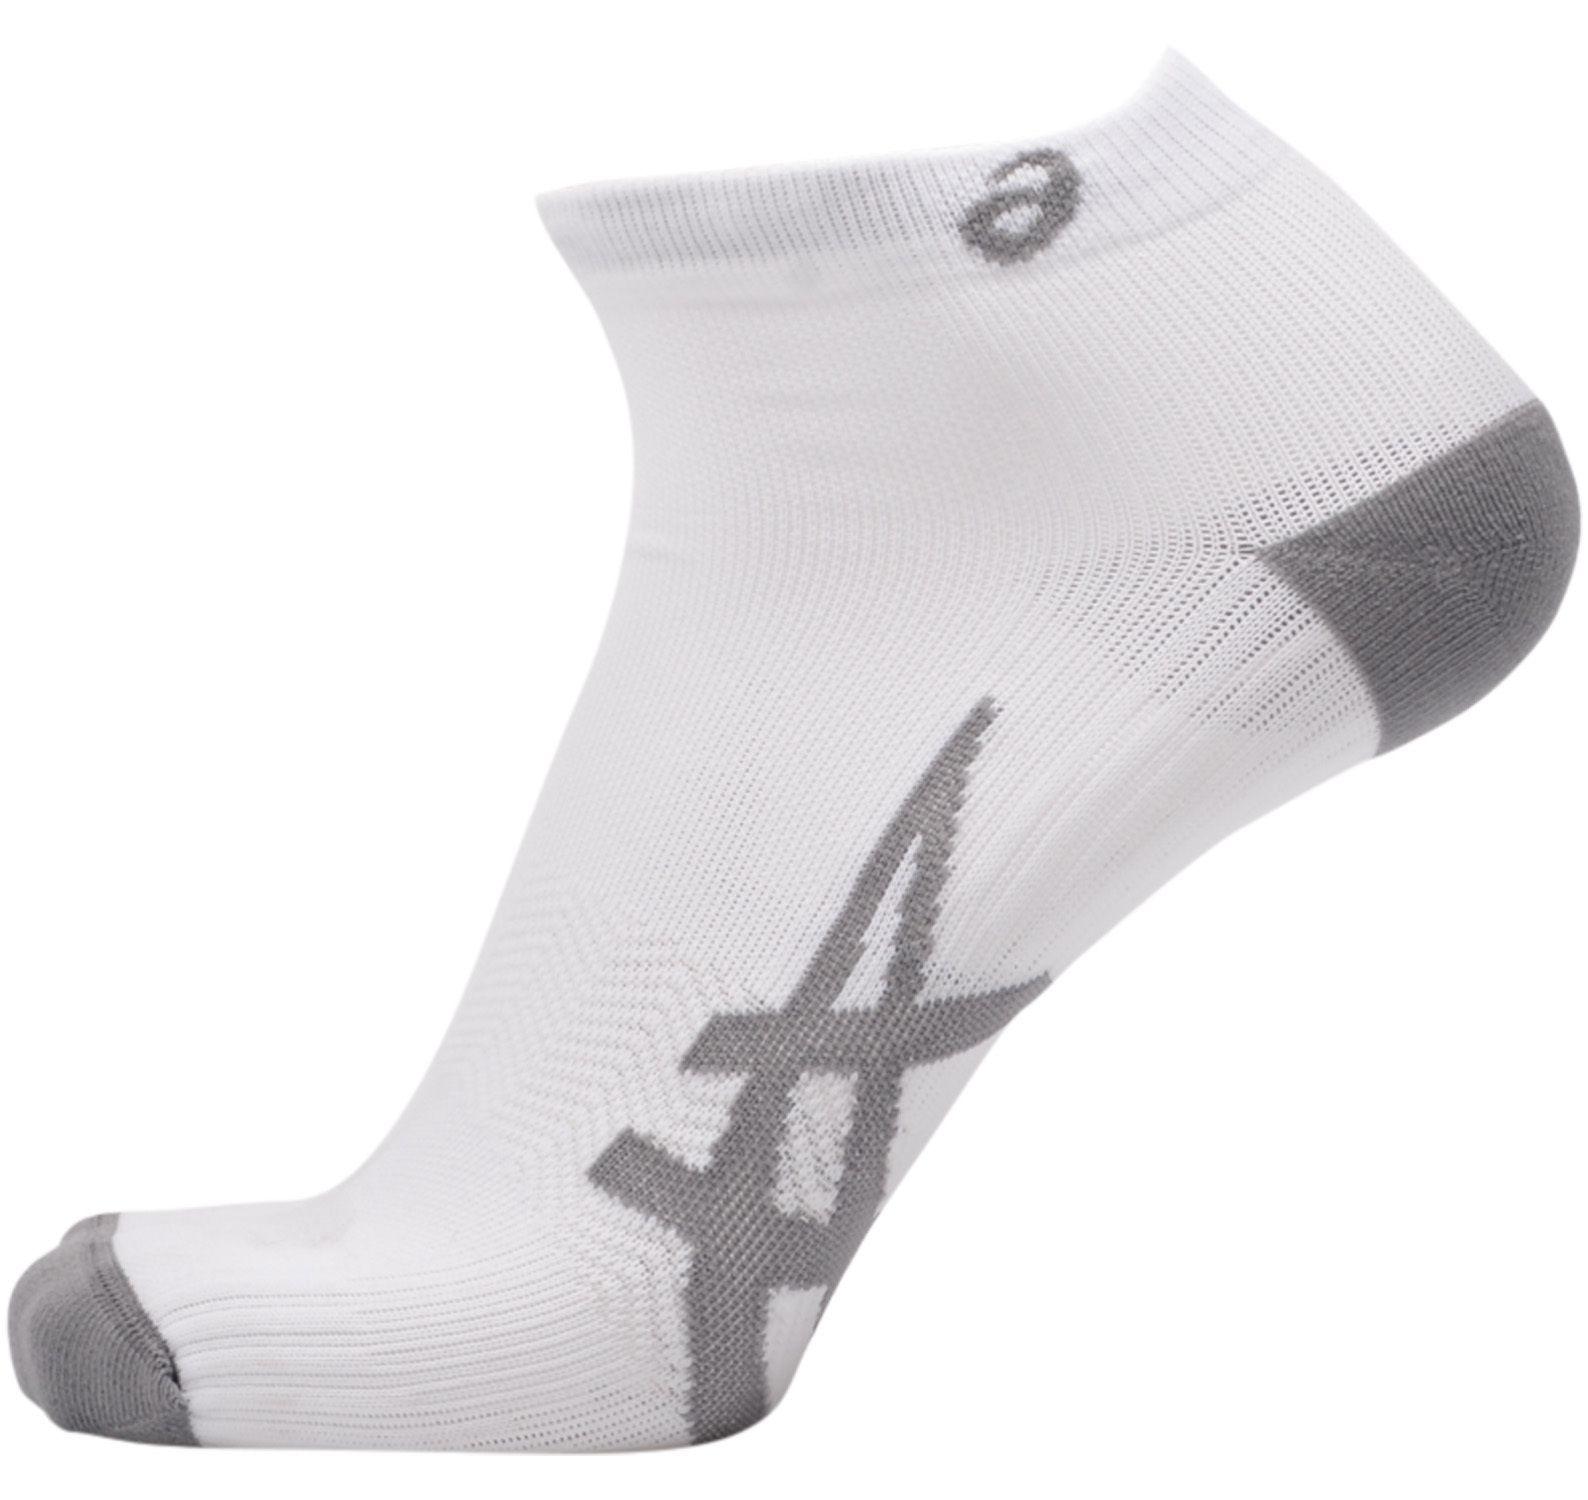 2ppk Lightweight Sock, Real White, 35-38,  Kläder